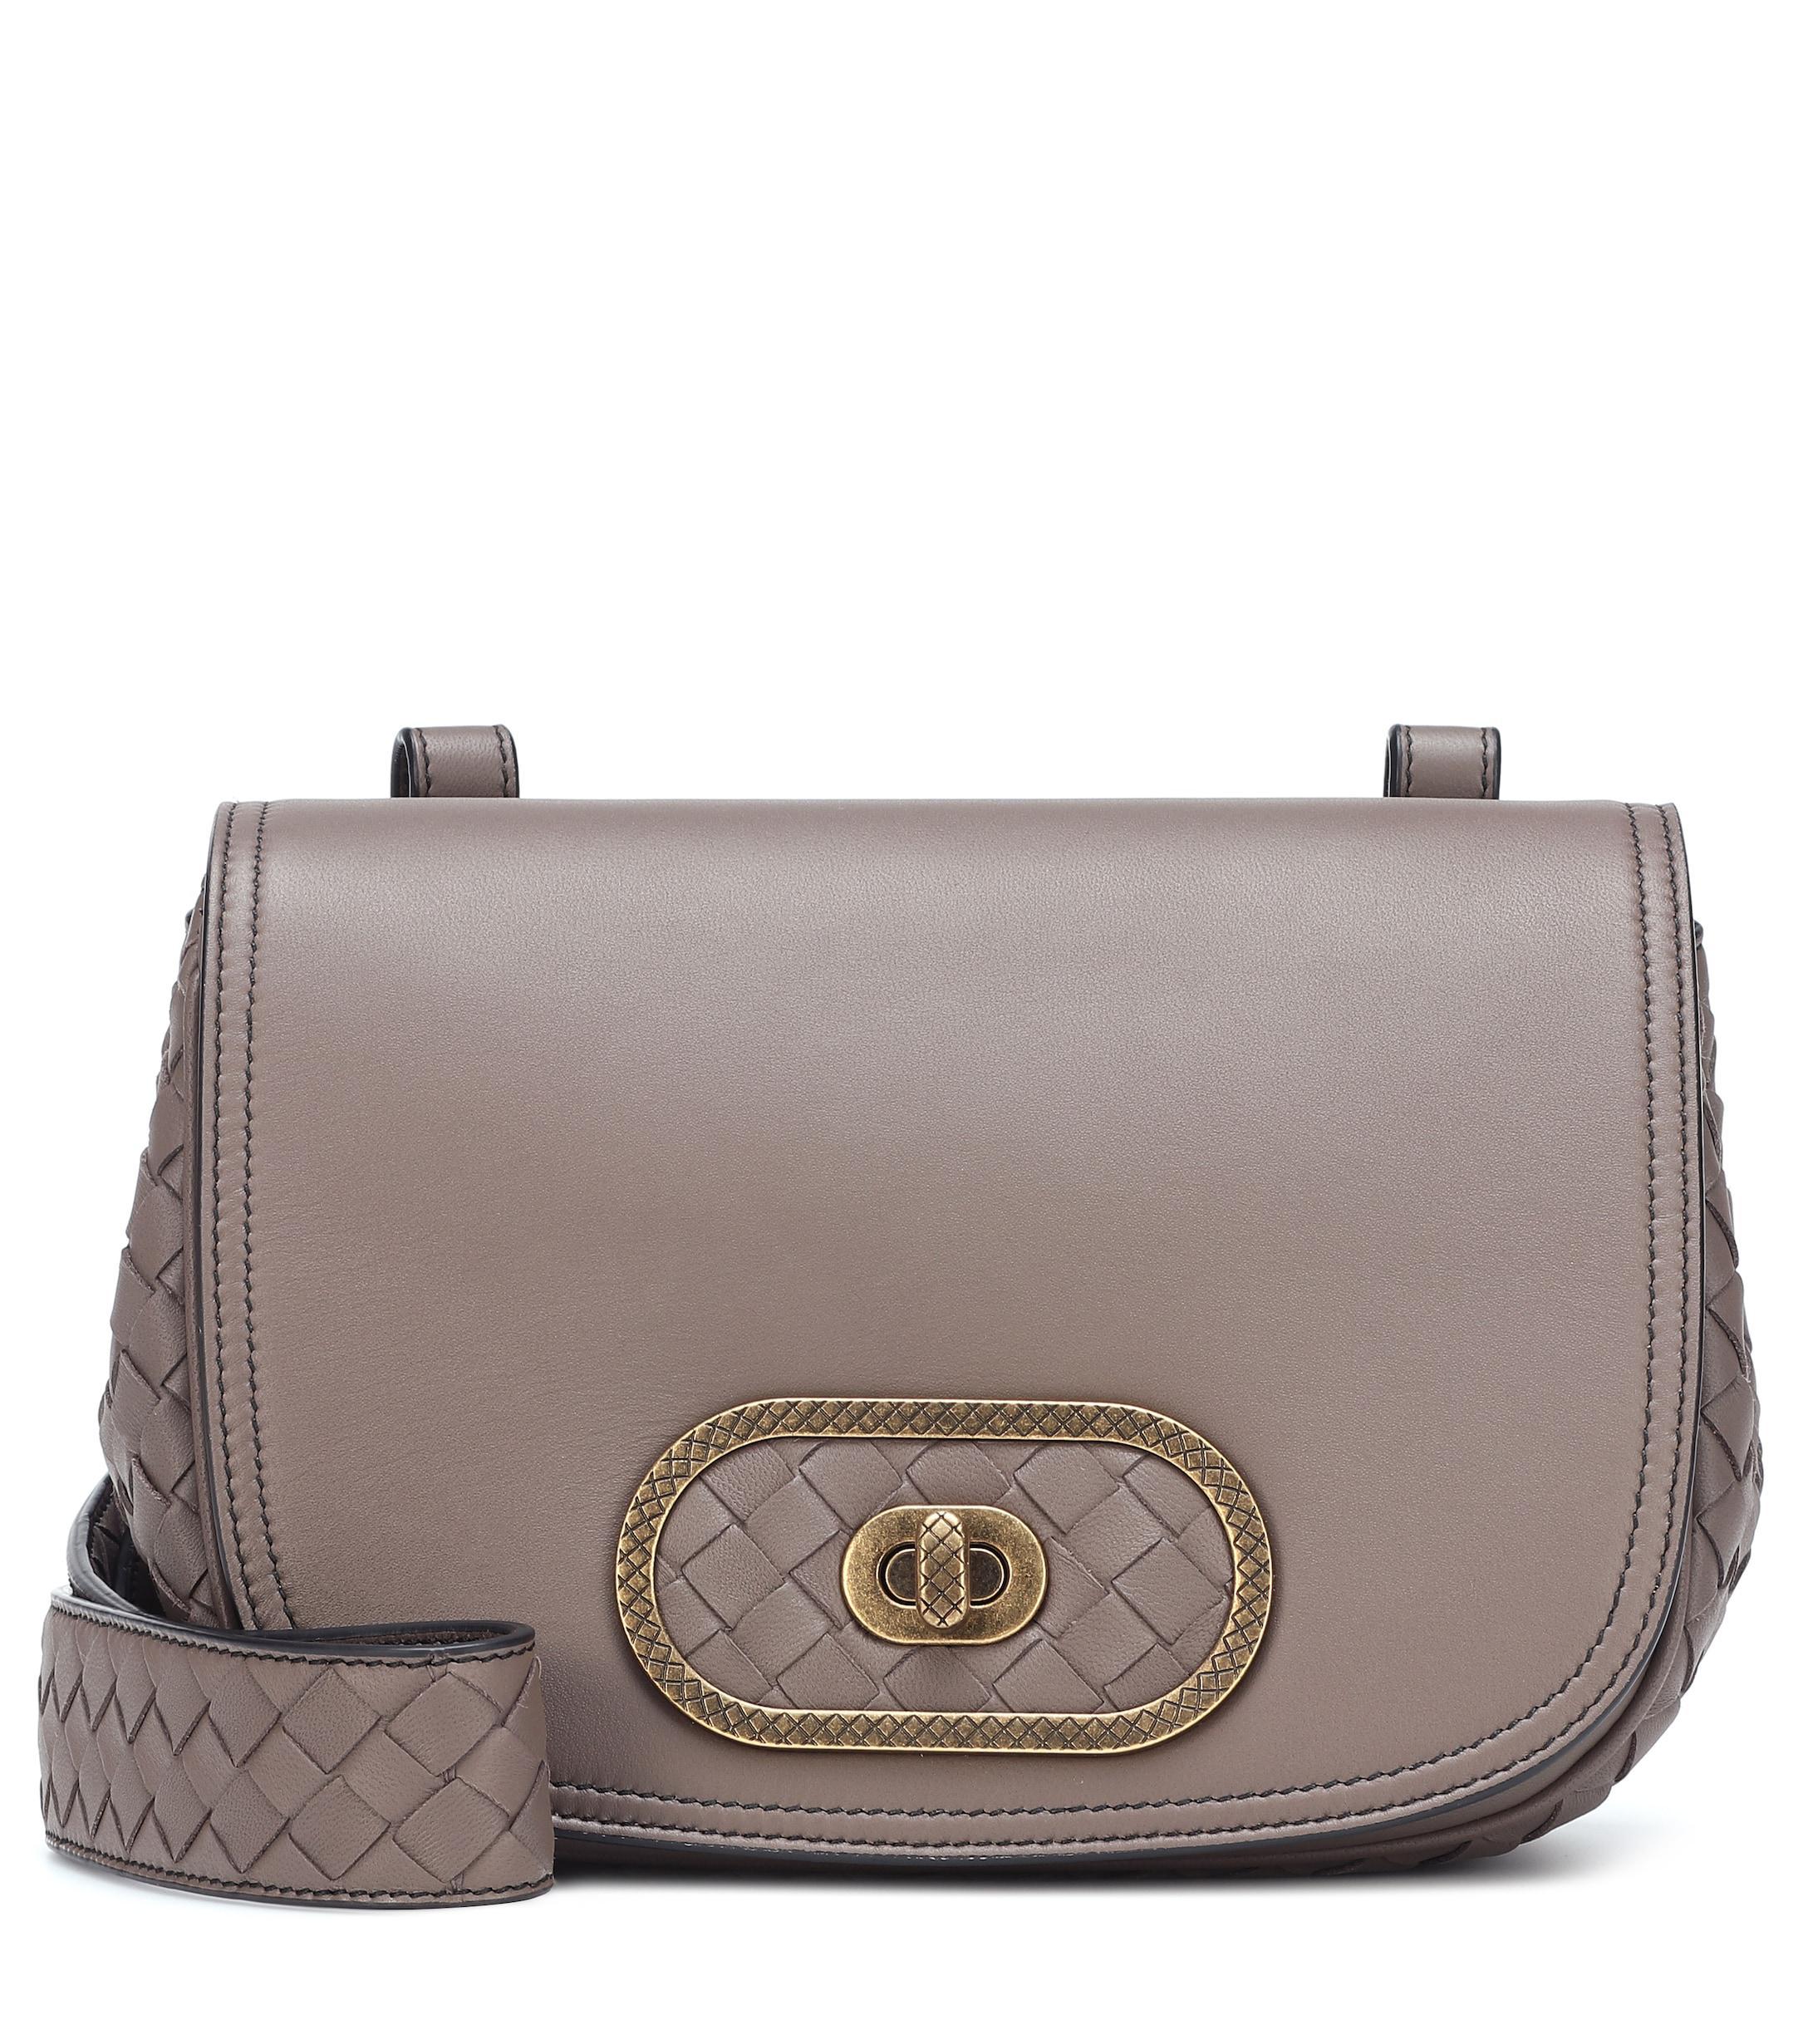 dc54c0f00a9e Bottega Veneta. Women s Bv Luna Leather Crossbody Bag